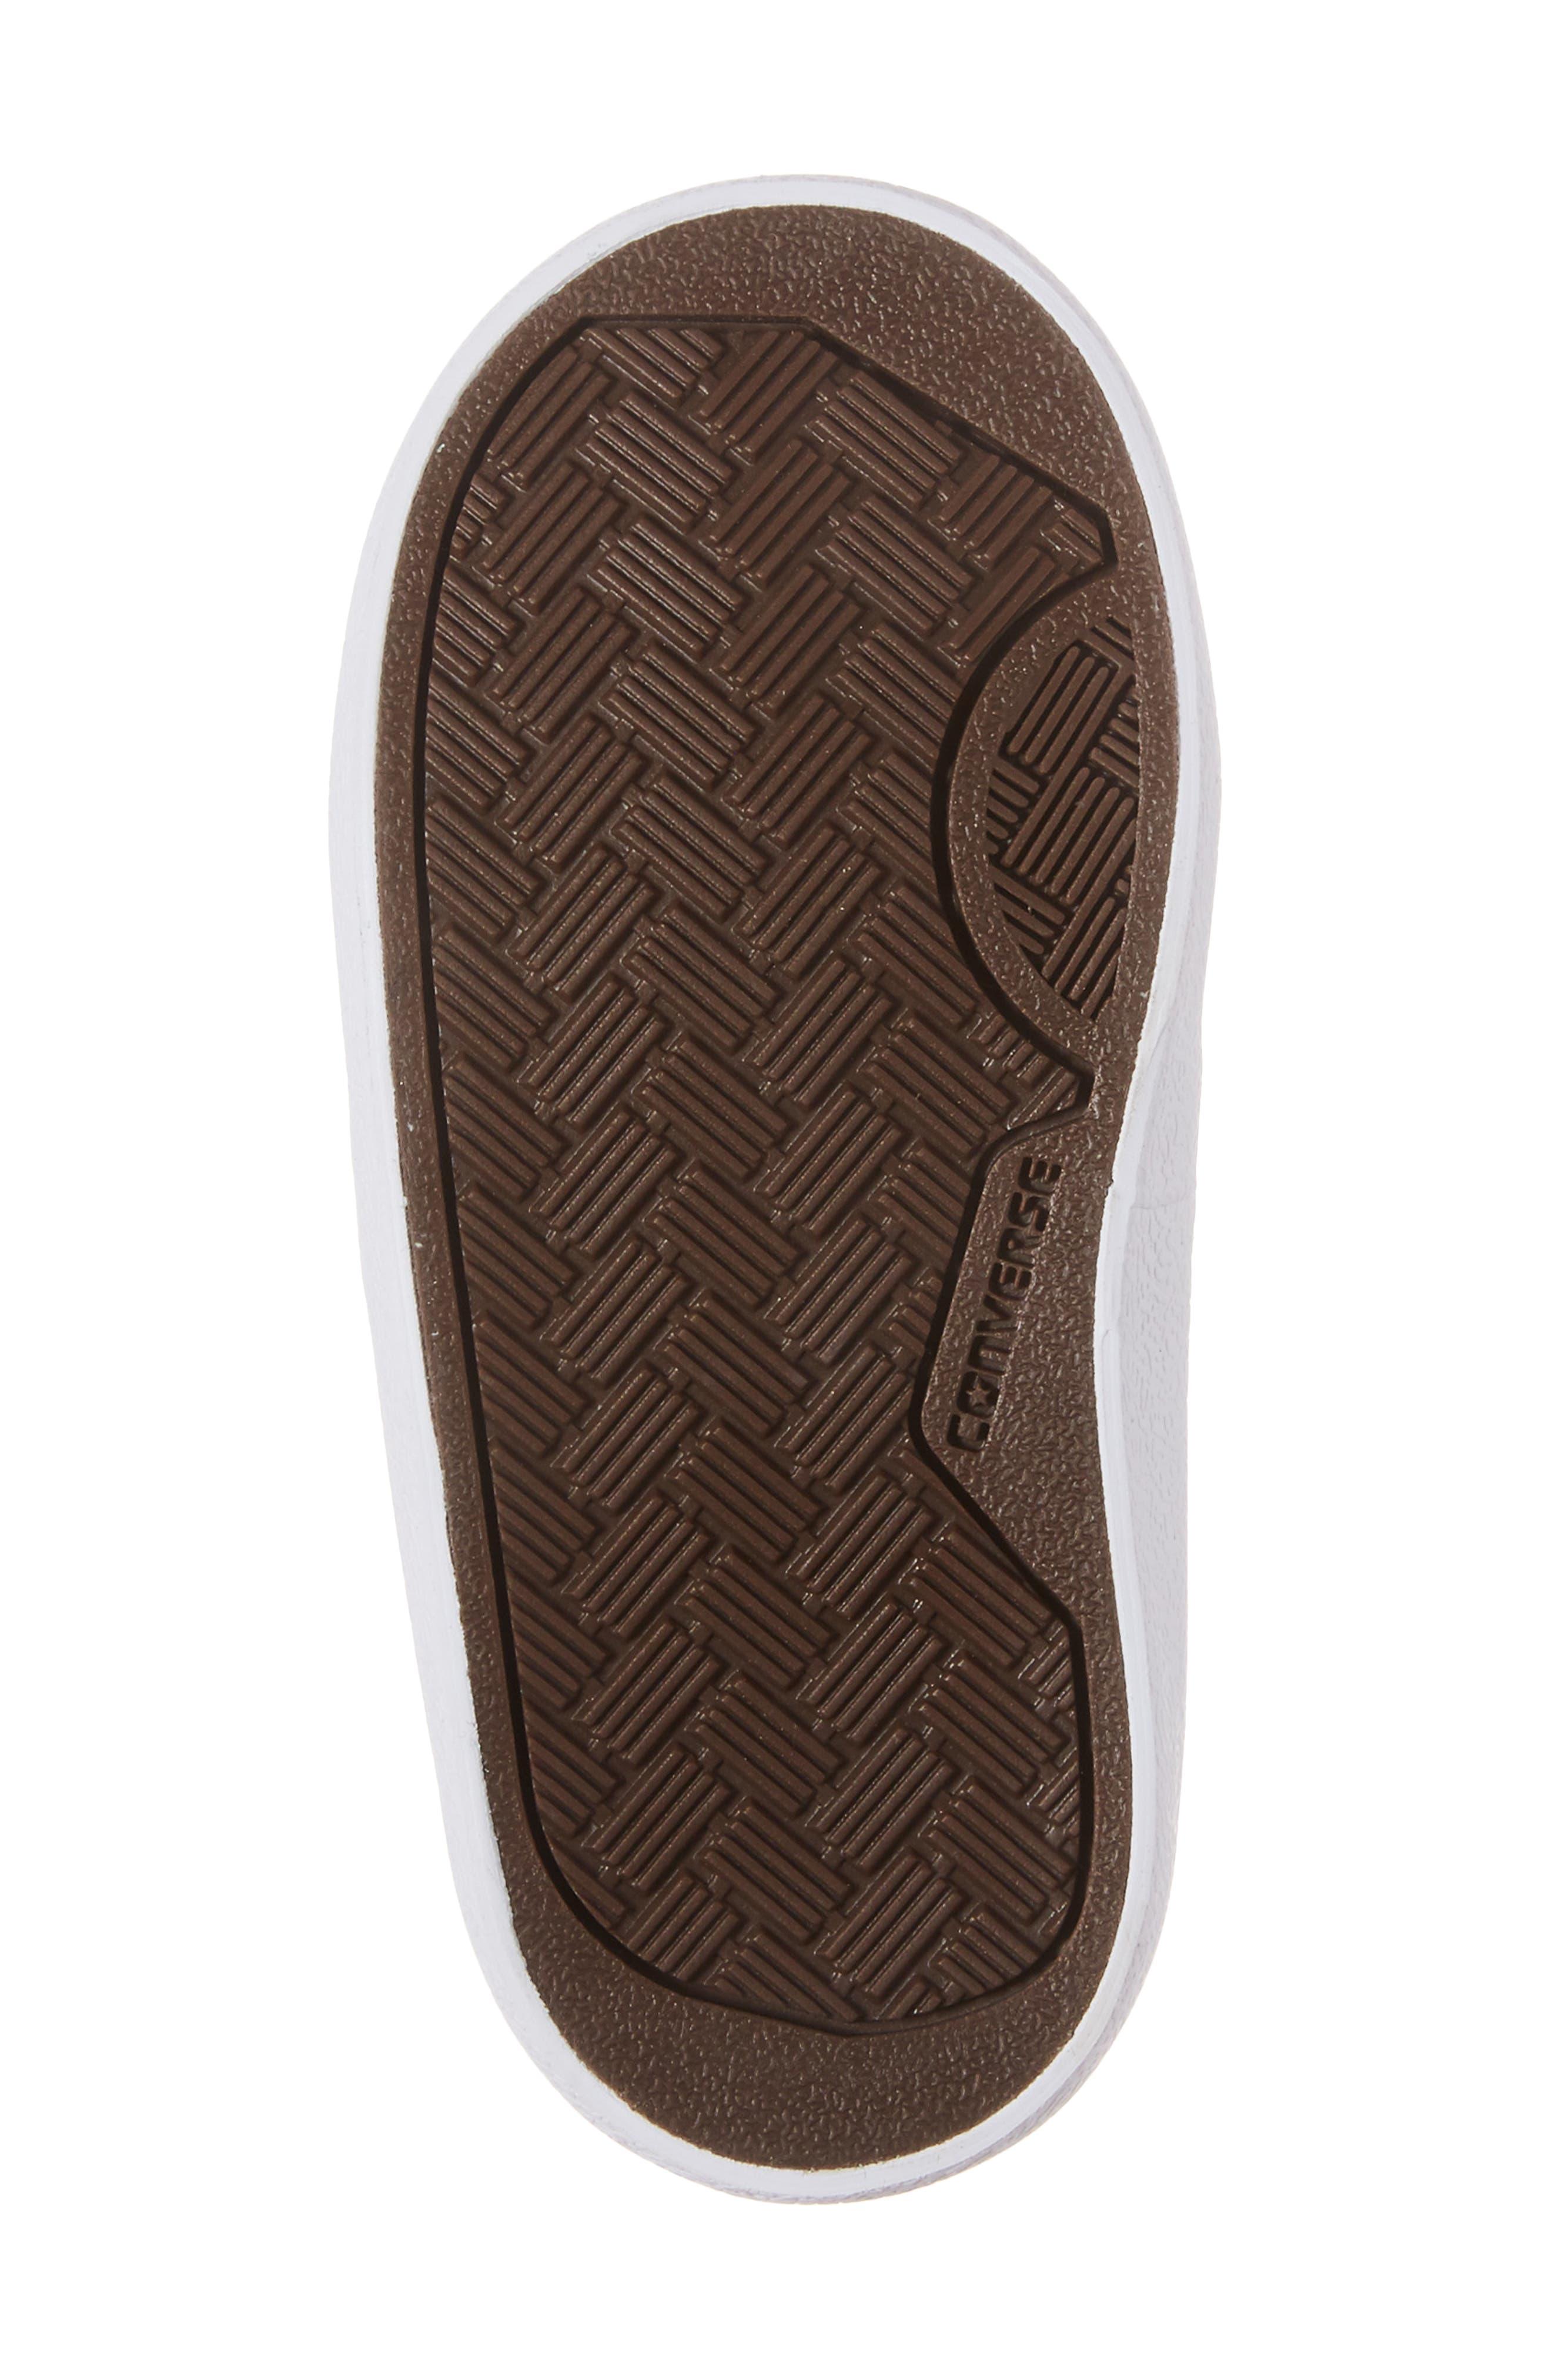 Breakpoint Sneaker,                             Alternate thumbnail 6, color,                             300